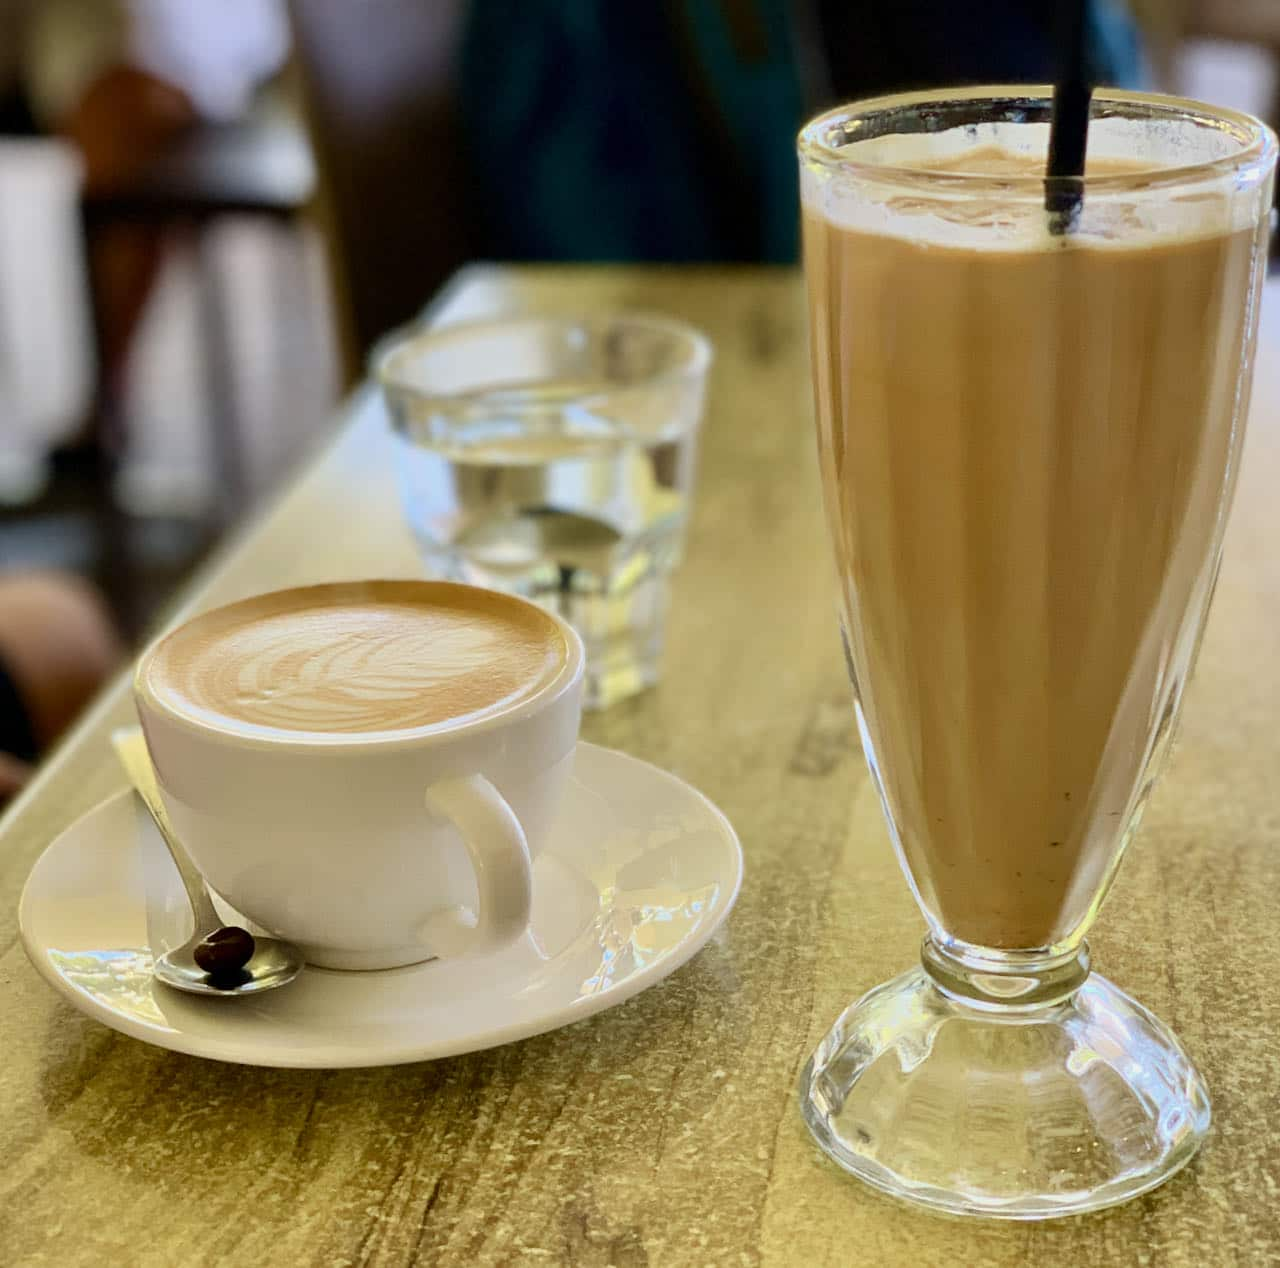 Cairns Road Trip Jaques Coffee Plantation